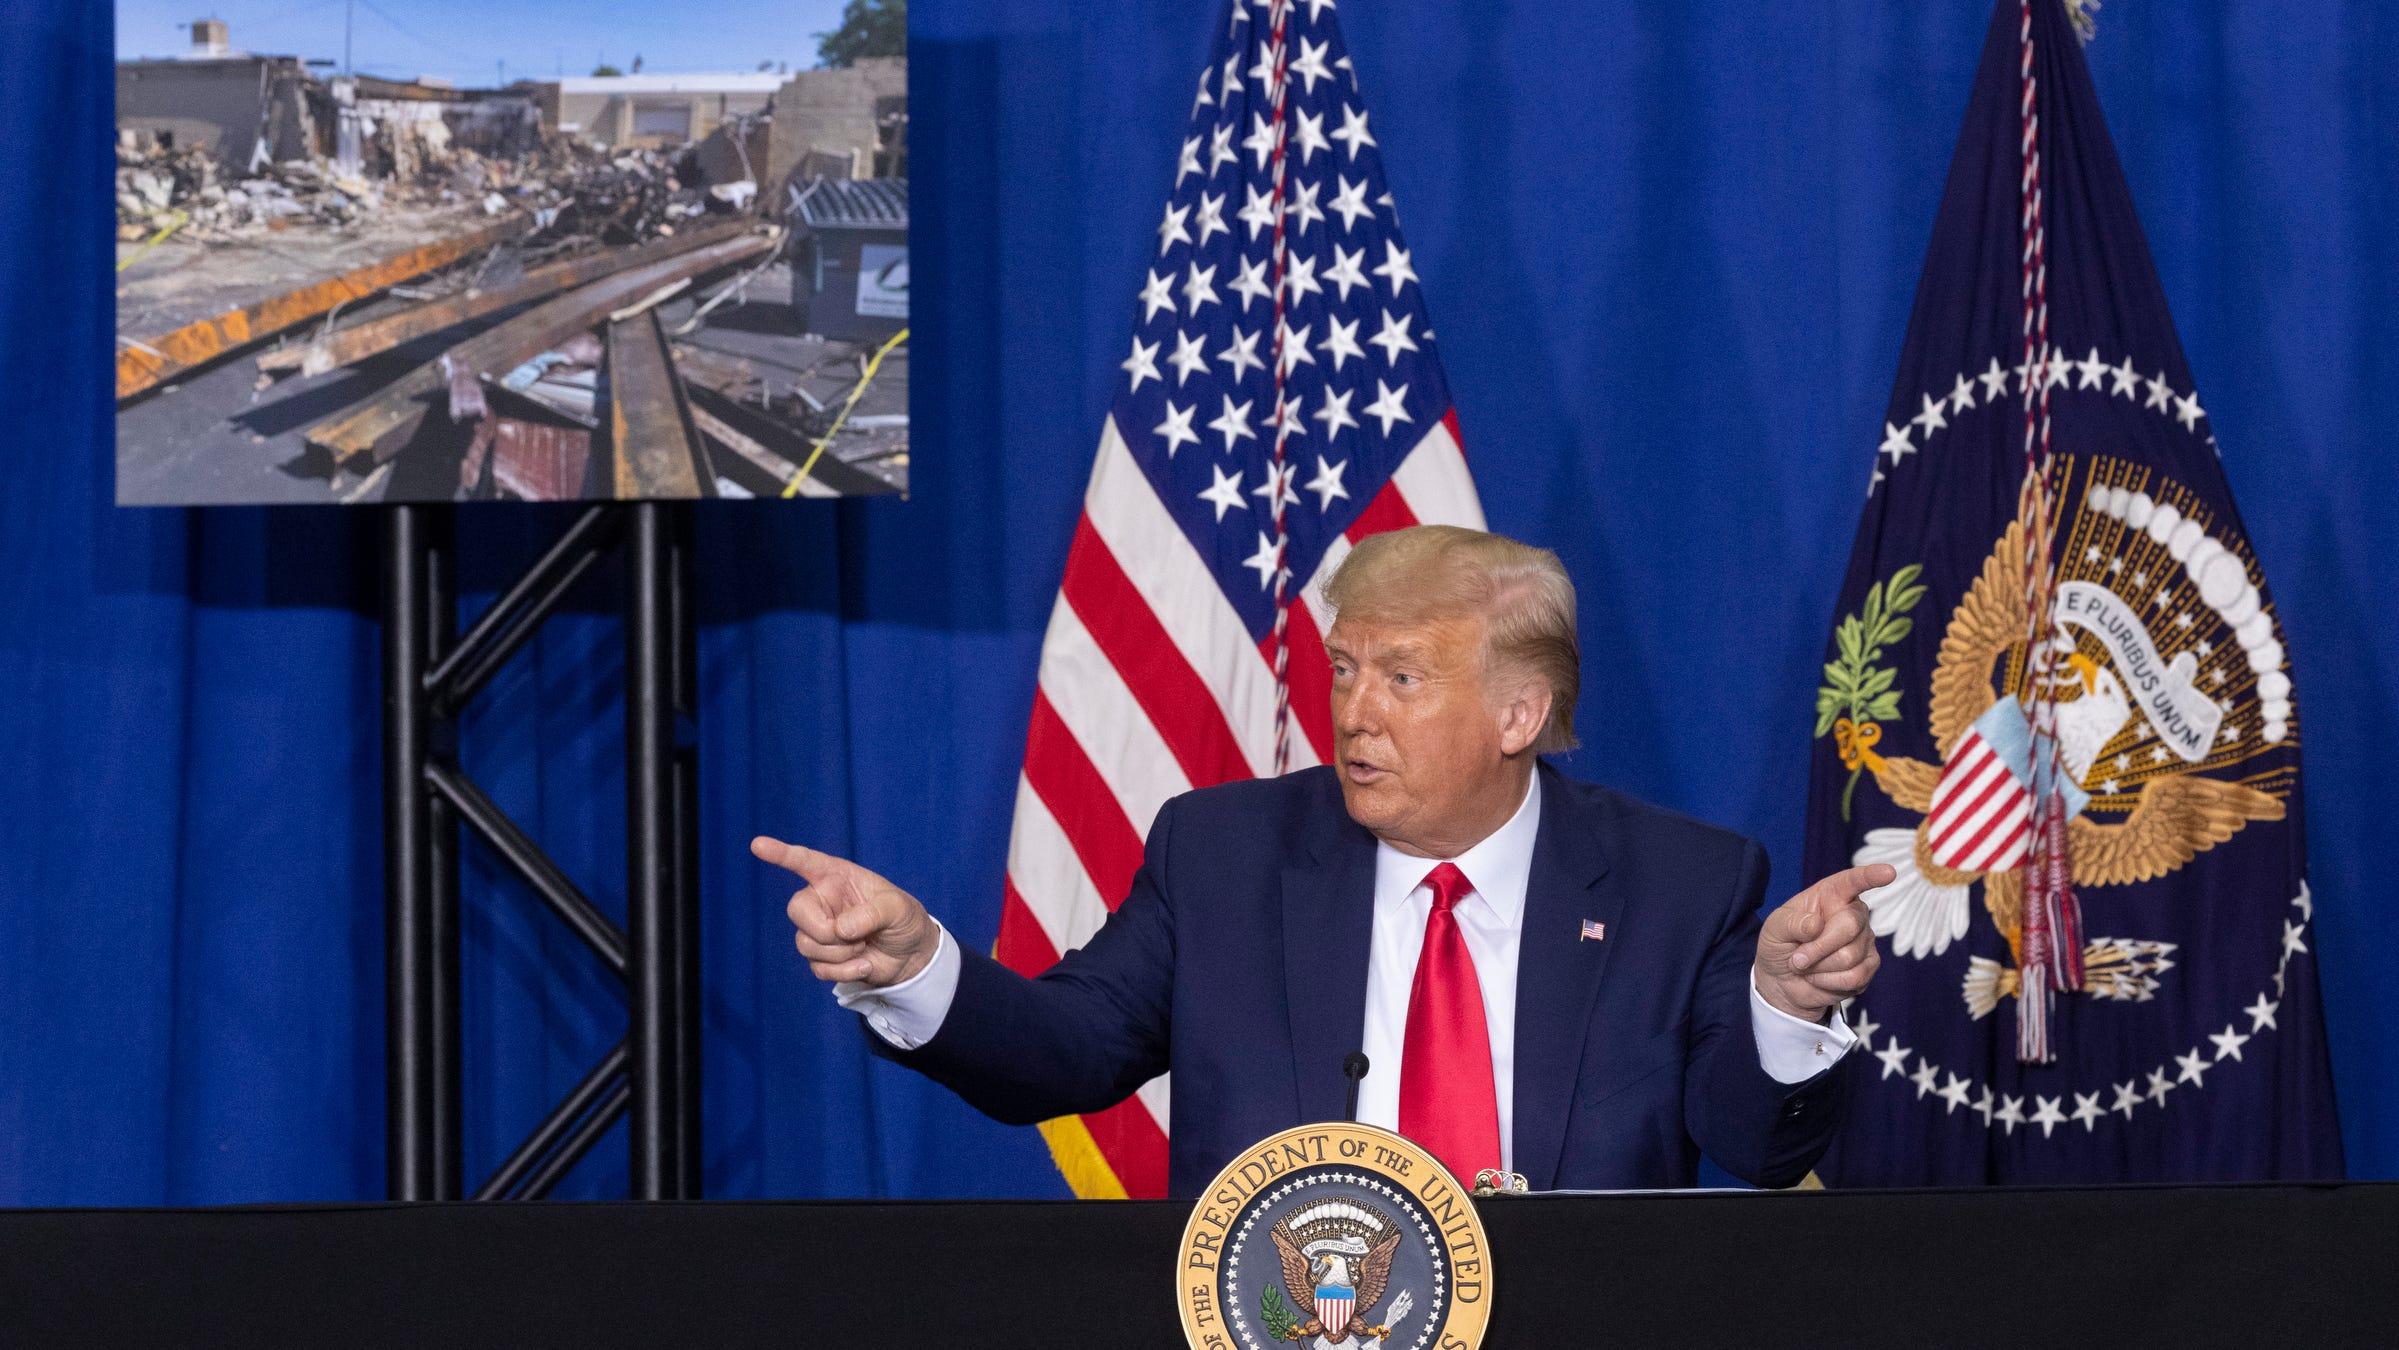 Trump visiting La Crosse and Green Bay on Saturday